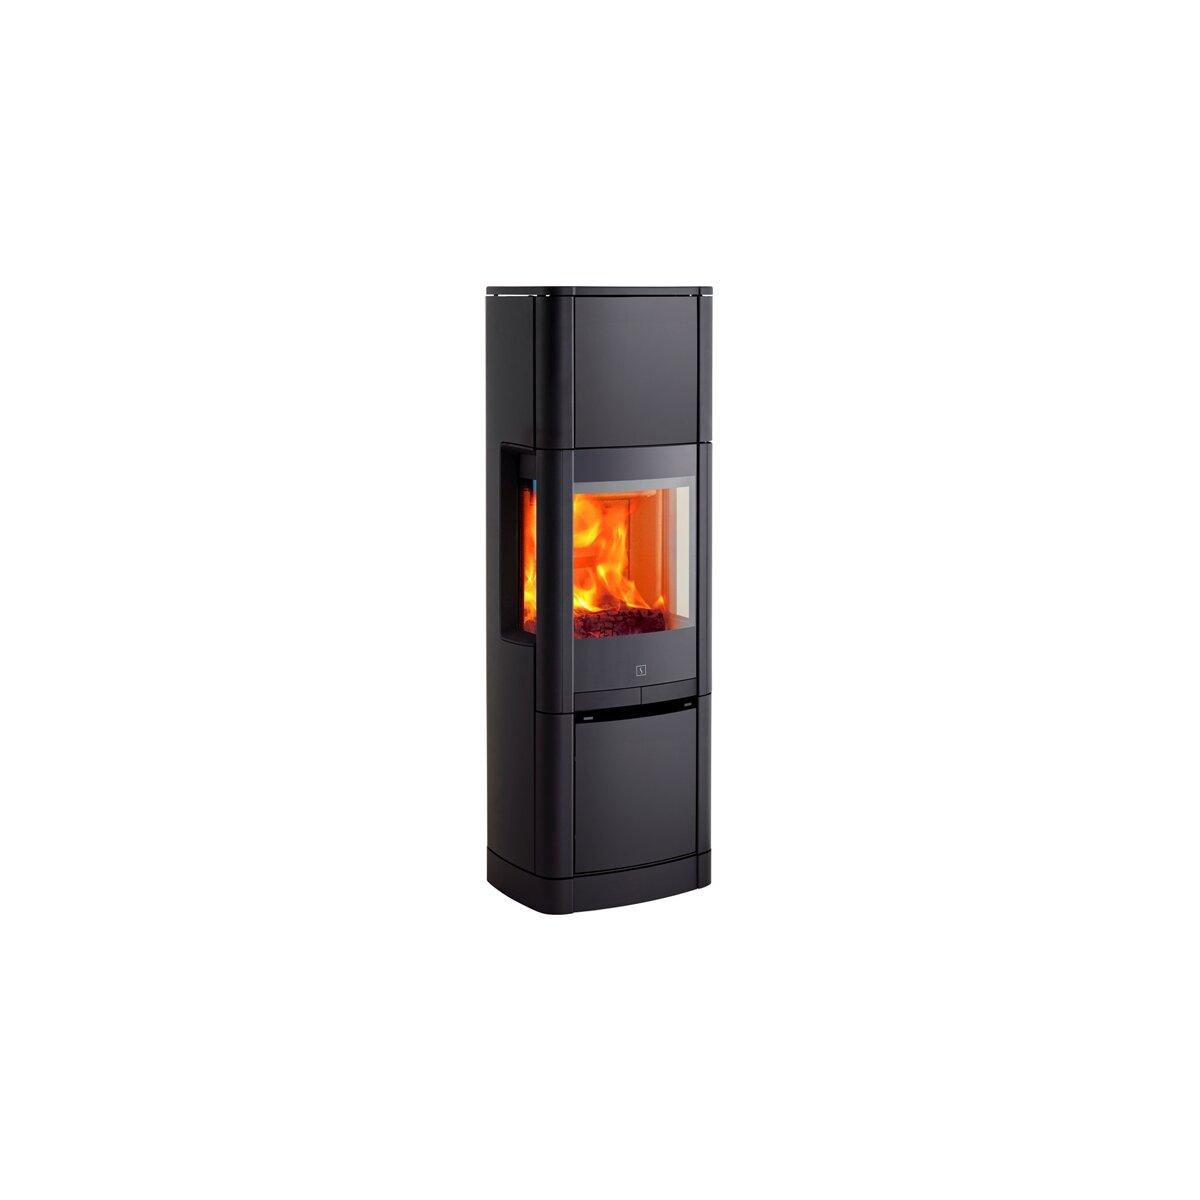 kaminofen scan 65 10 hightop online kaufen feuer fuchs. Black Bedroom Furniture Sets. Home Design Ideas